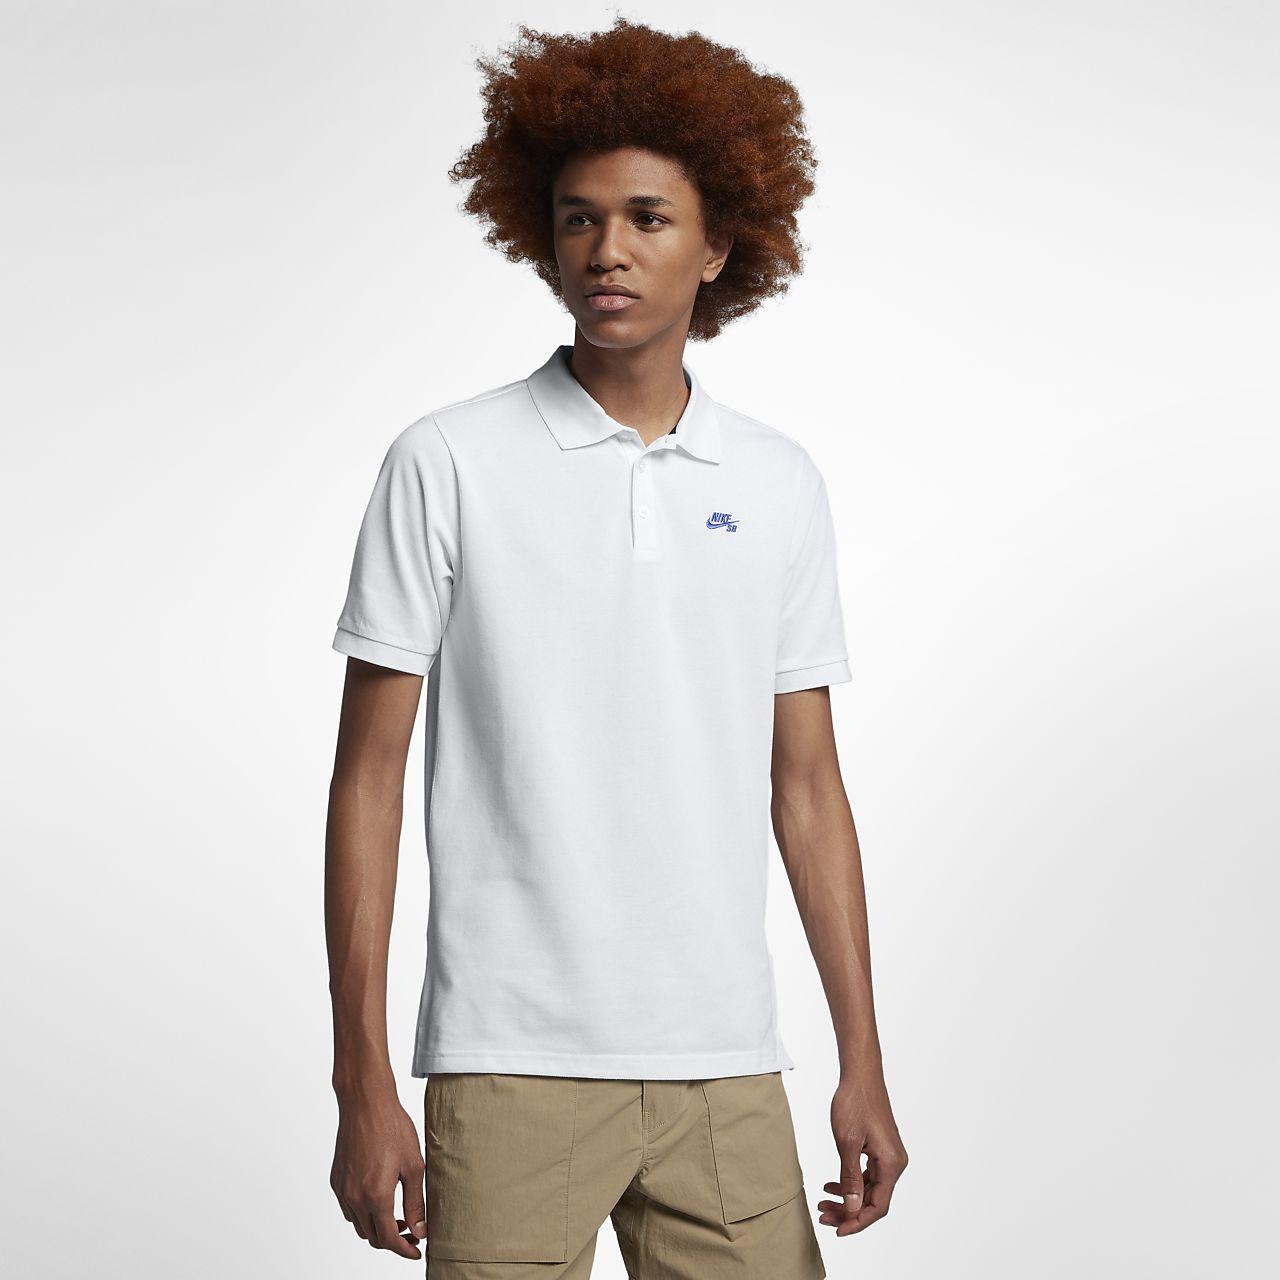 a6c98c0d46969 Polo para hombre Nike SB Dri-FIT Pique. Nike.com MX